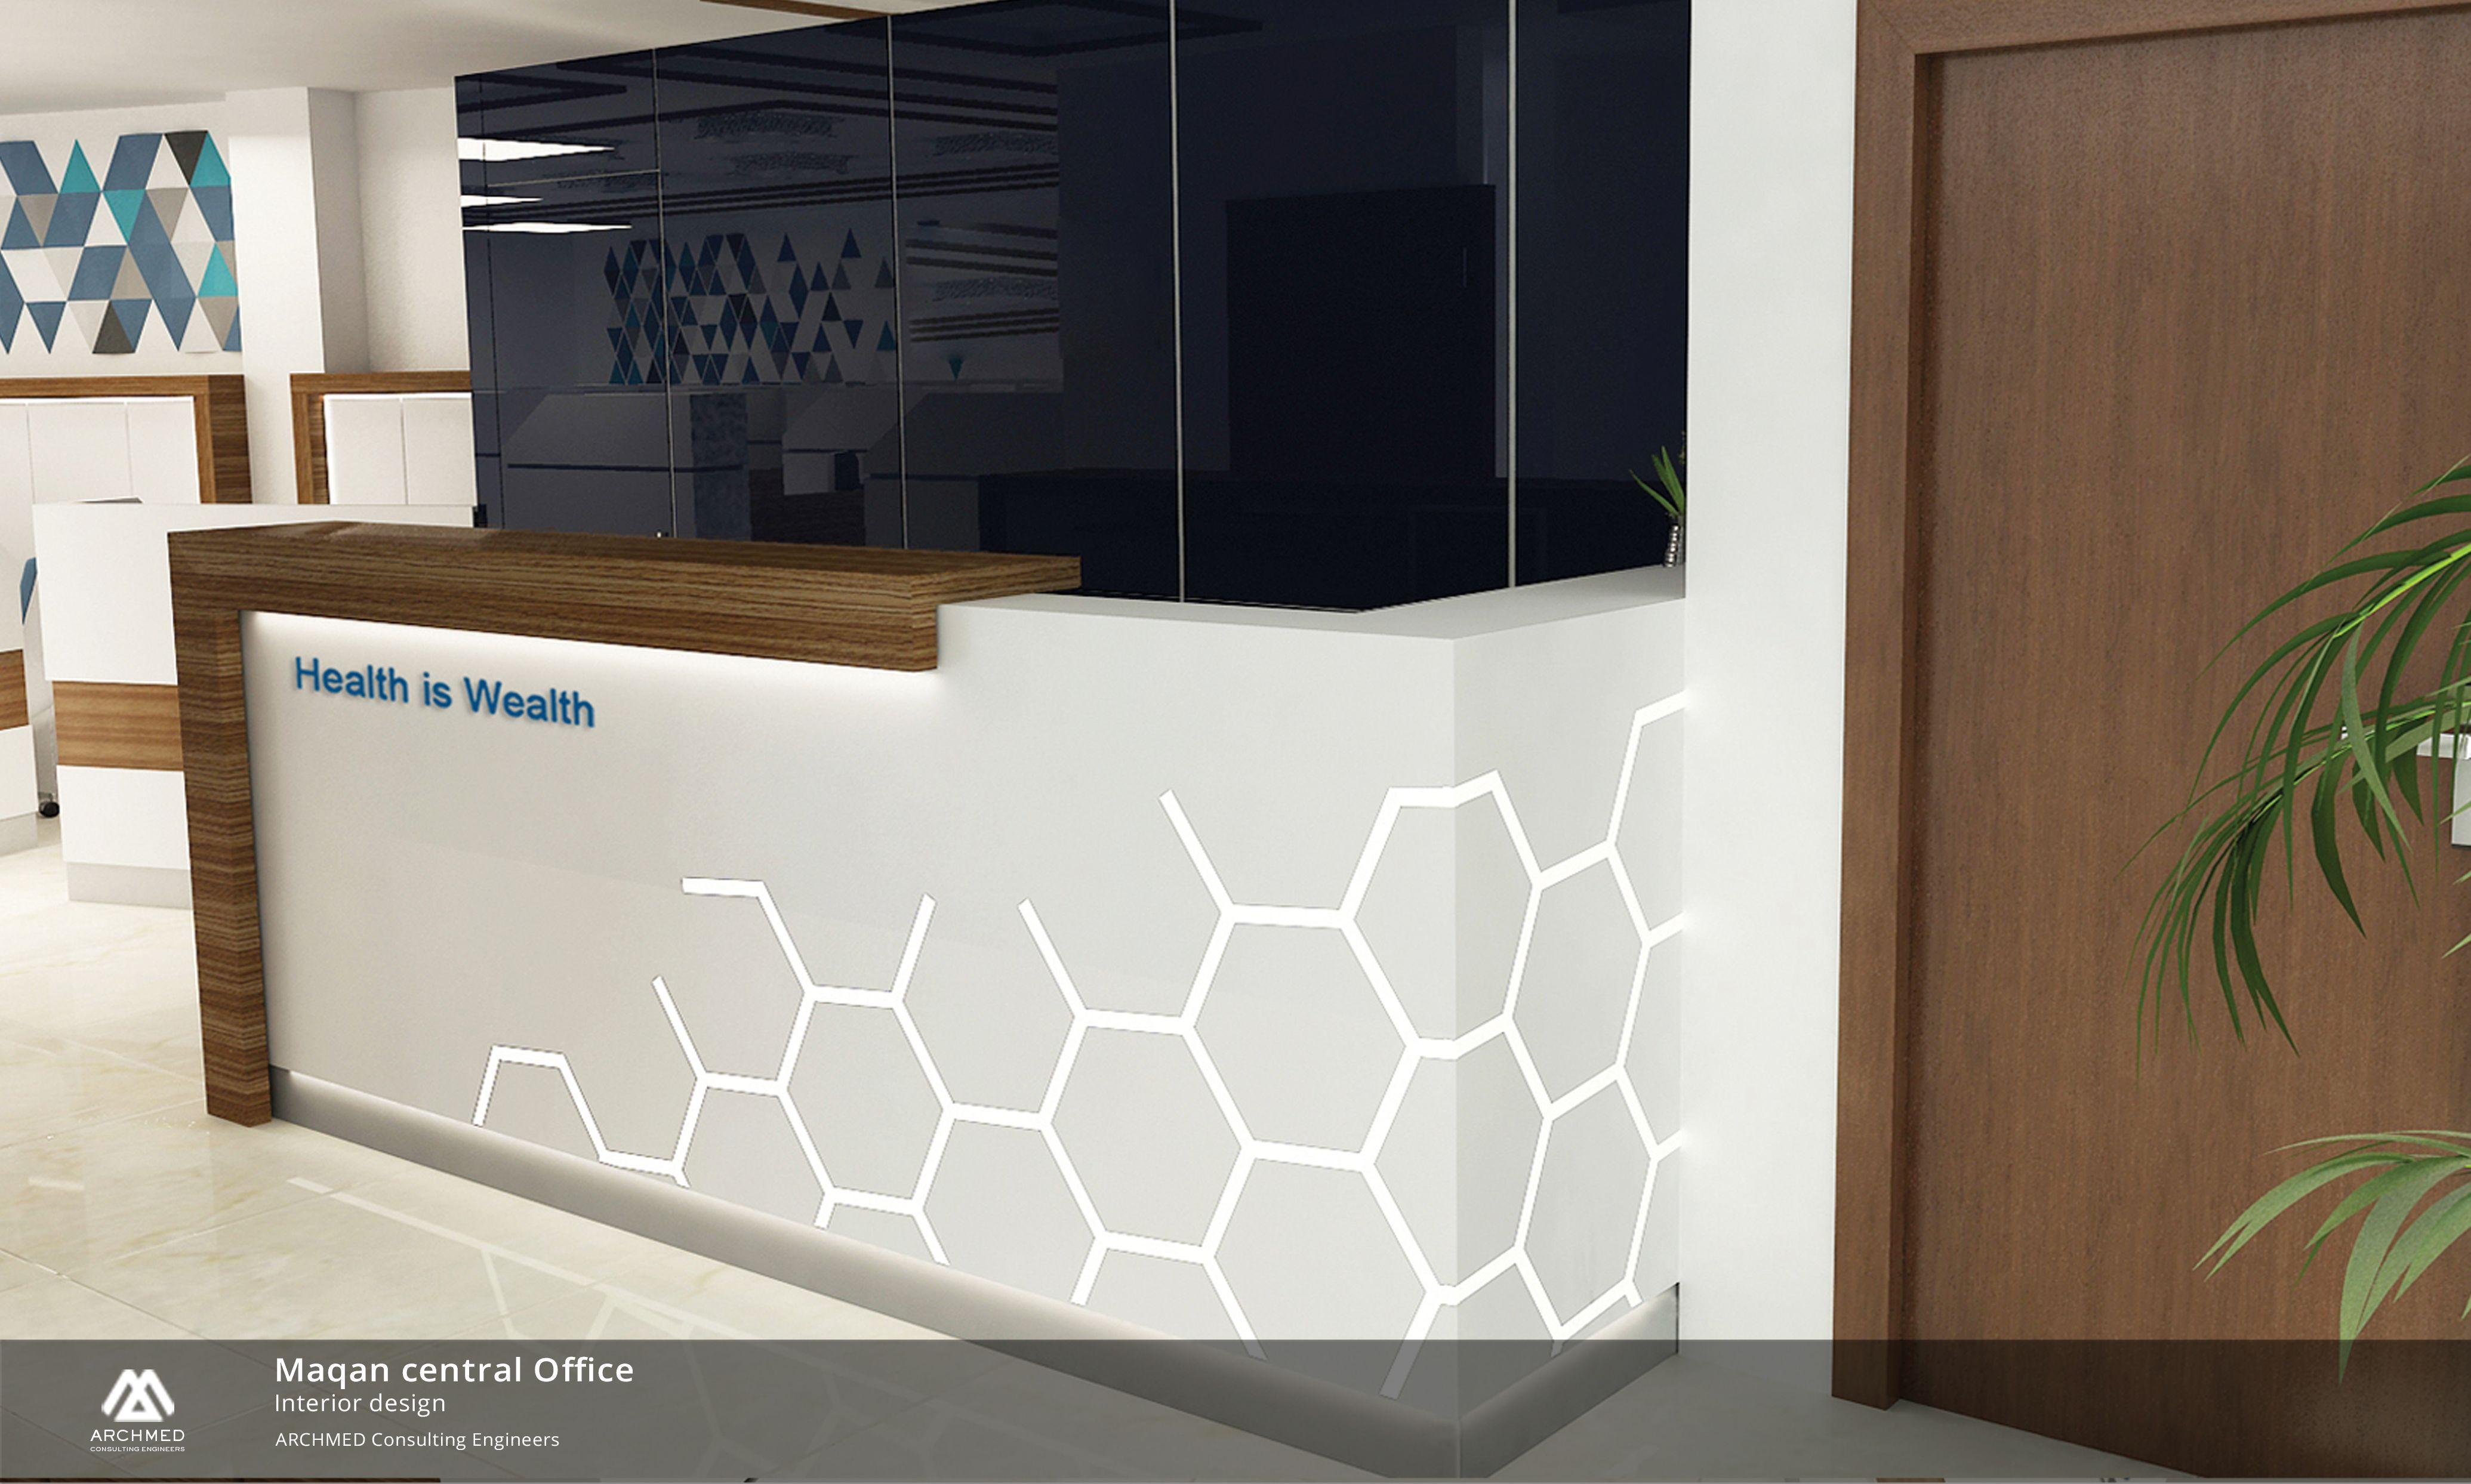 Maqan Office Design طراحي معماري داخلي دفتر اداري ماكان Architecture Hospital Medical Decoration Office Interior Design Office Interiors Interior Design